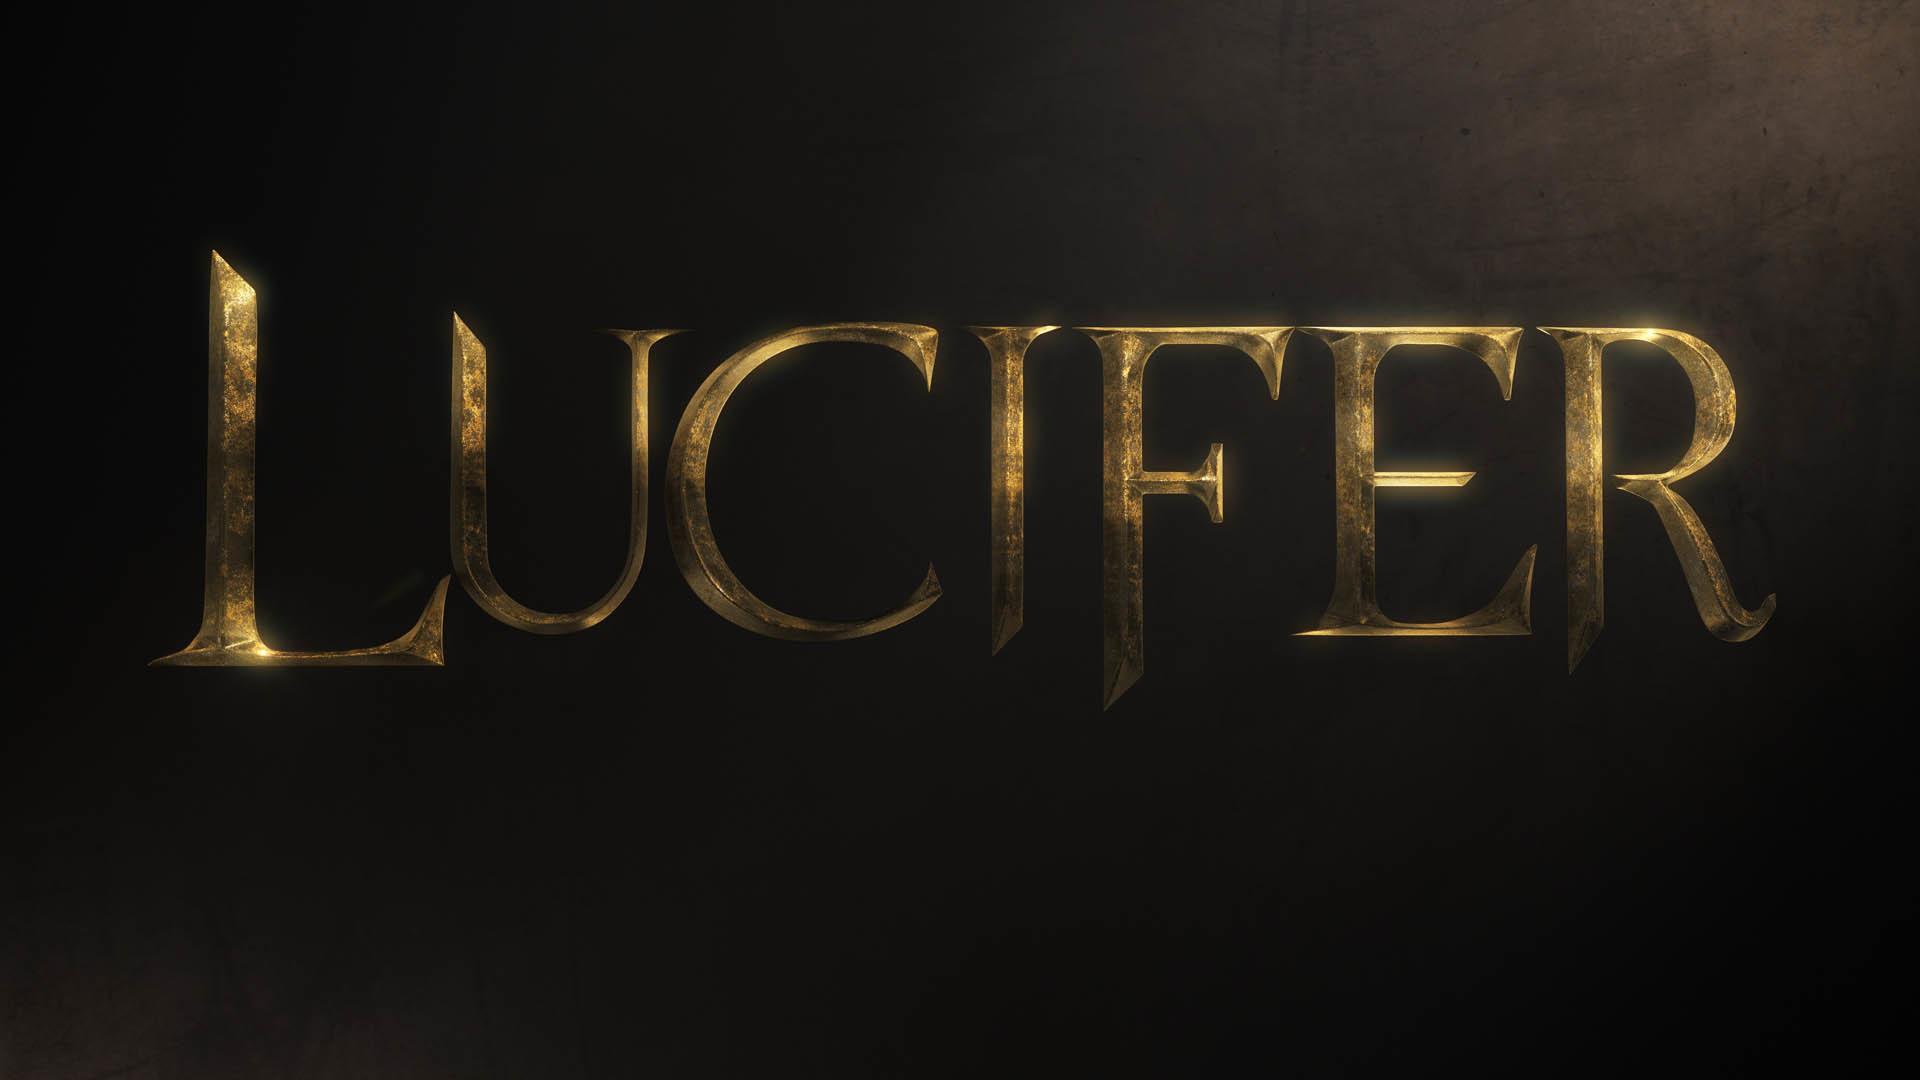 Fondos De Pantayas: Fondos De Pantalla De La Serie De Lucifer, Wallpapers HD